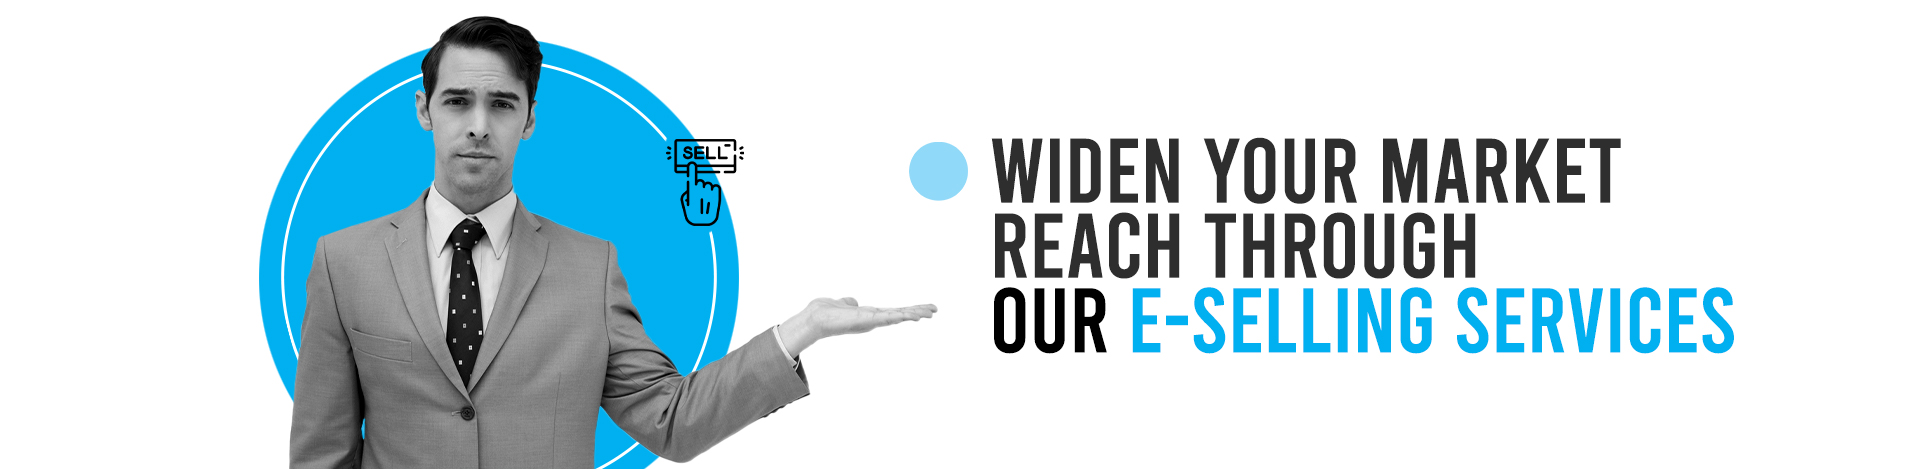 Top e-selling platform